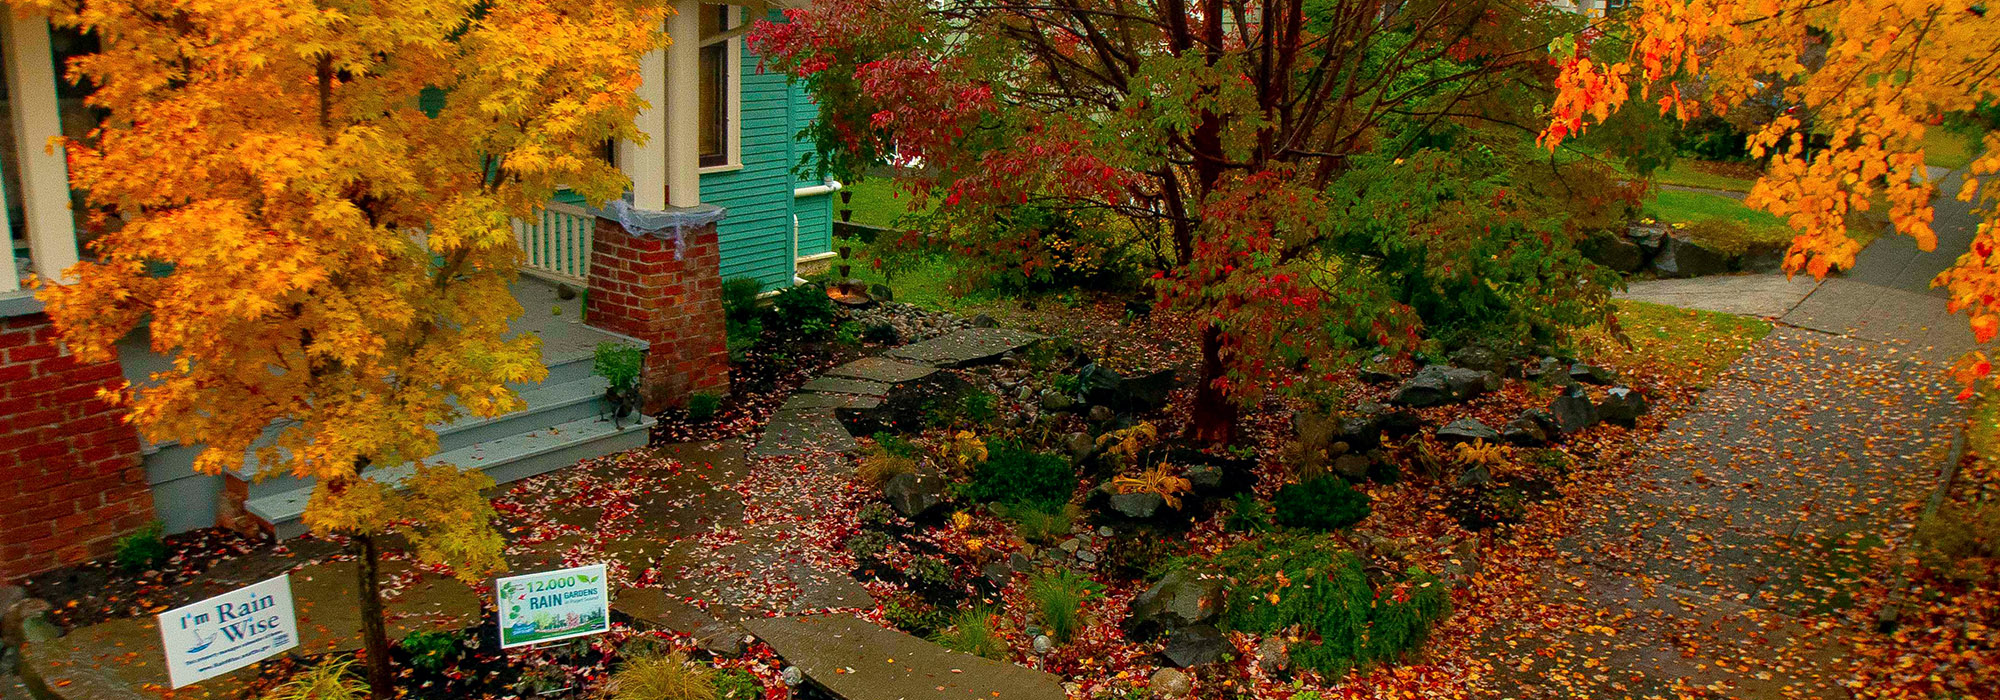 12,000 Rain Gardens | Stewardship Partners